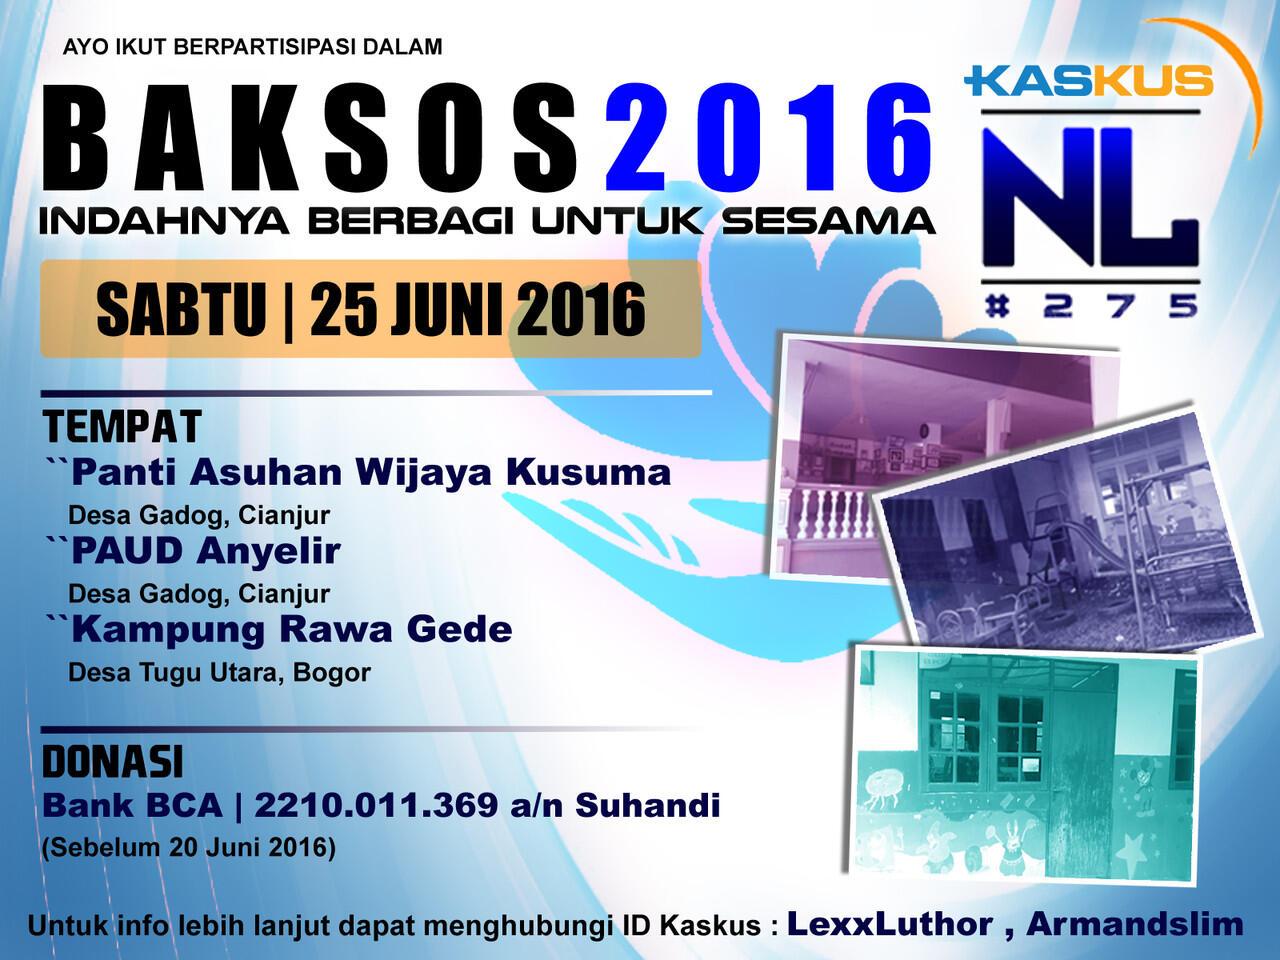 Baksos Kaskus NL #275 2016